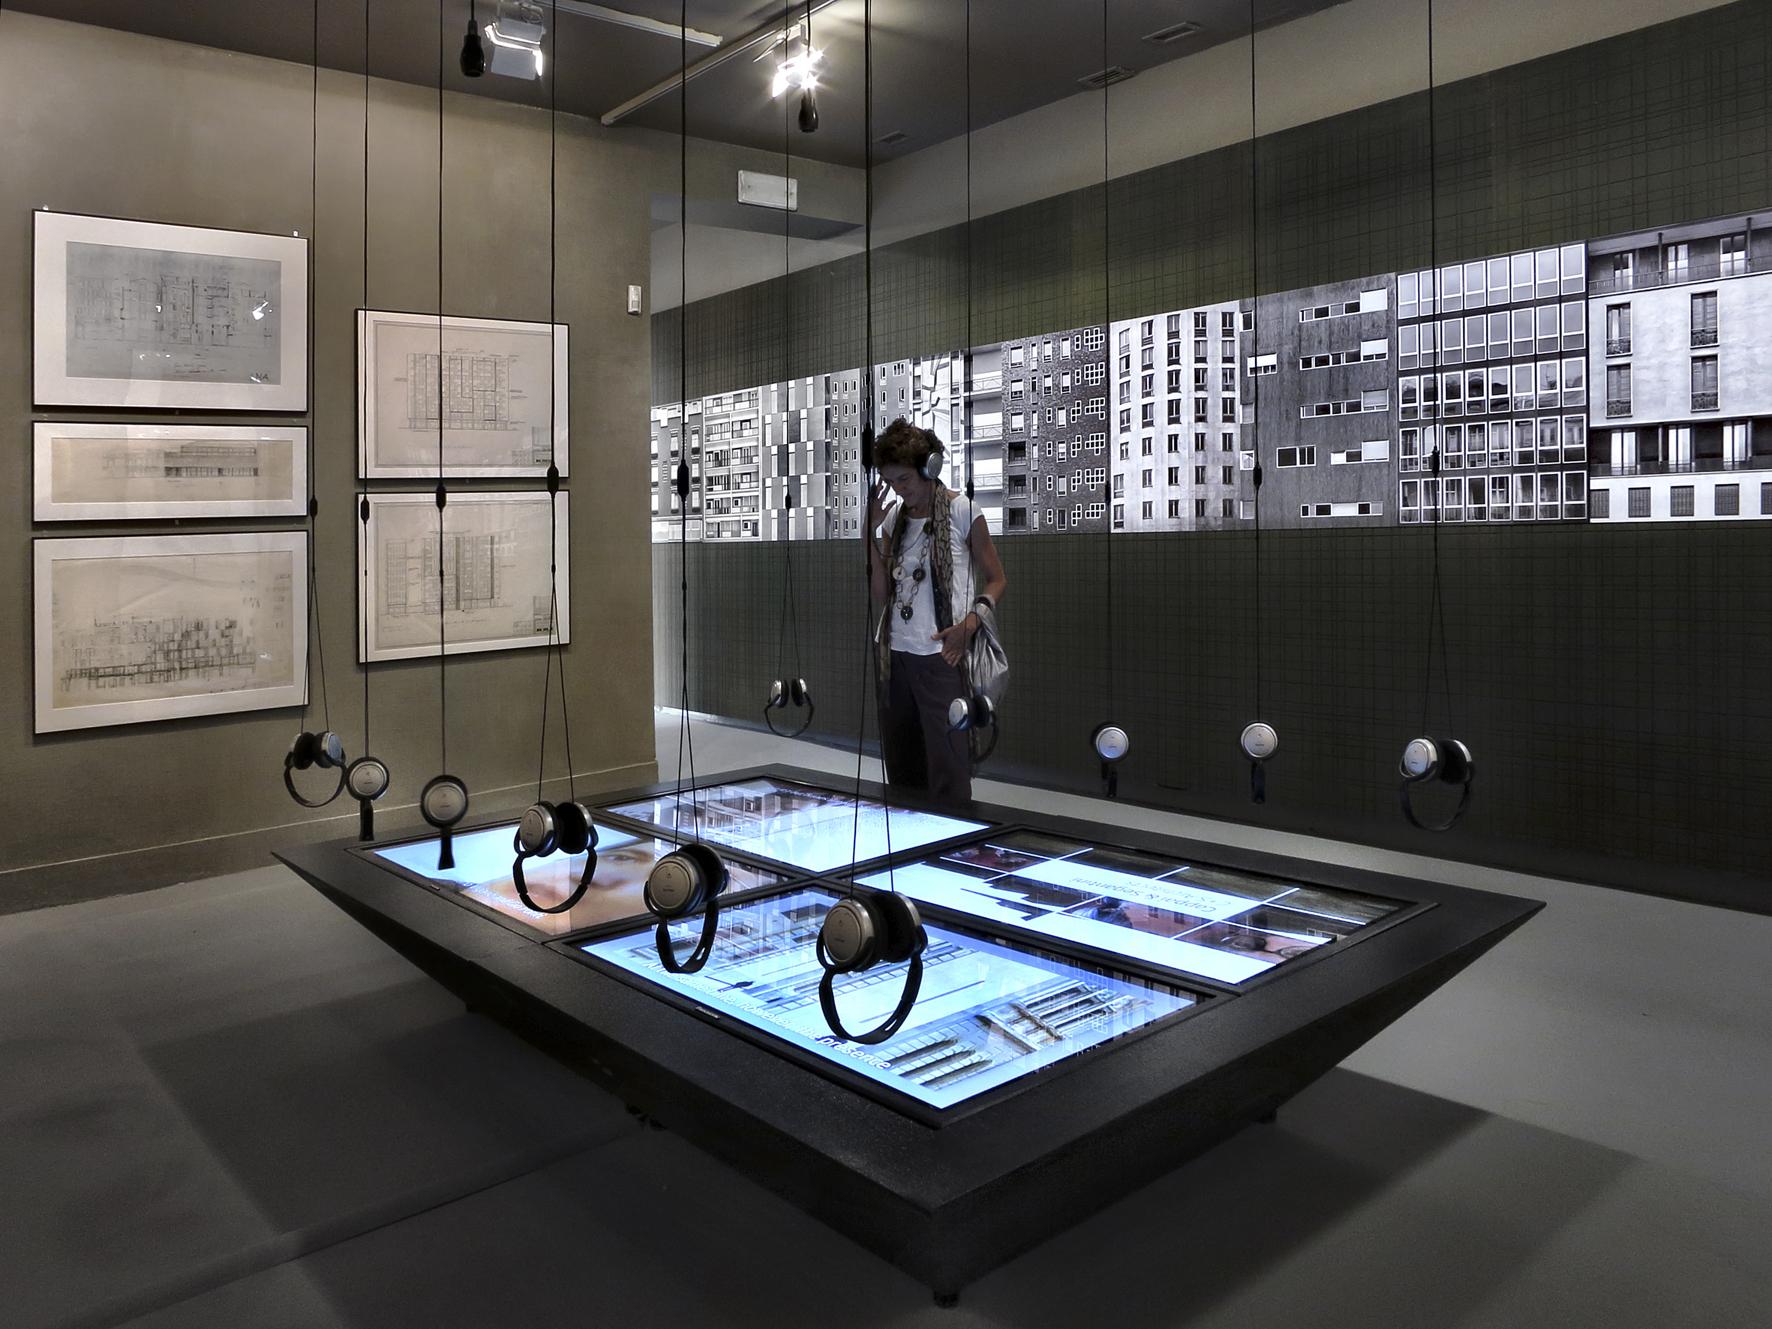 Bienal de Veneza 2012: Facecity / C+S Architects, © Pino Musi